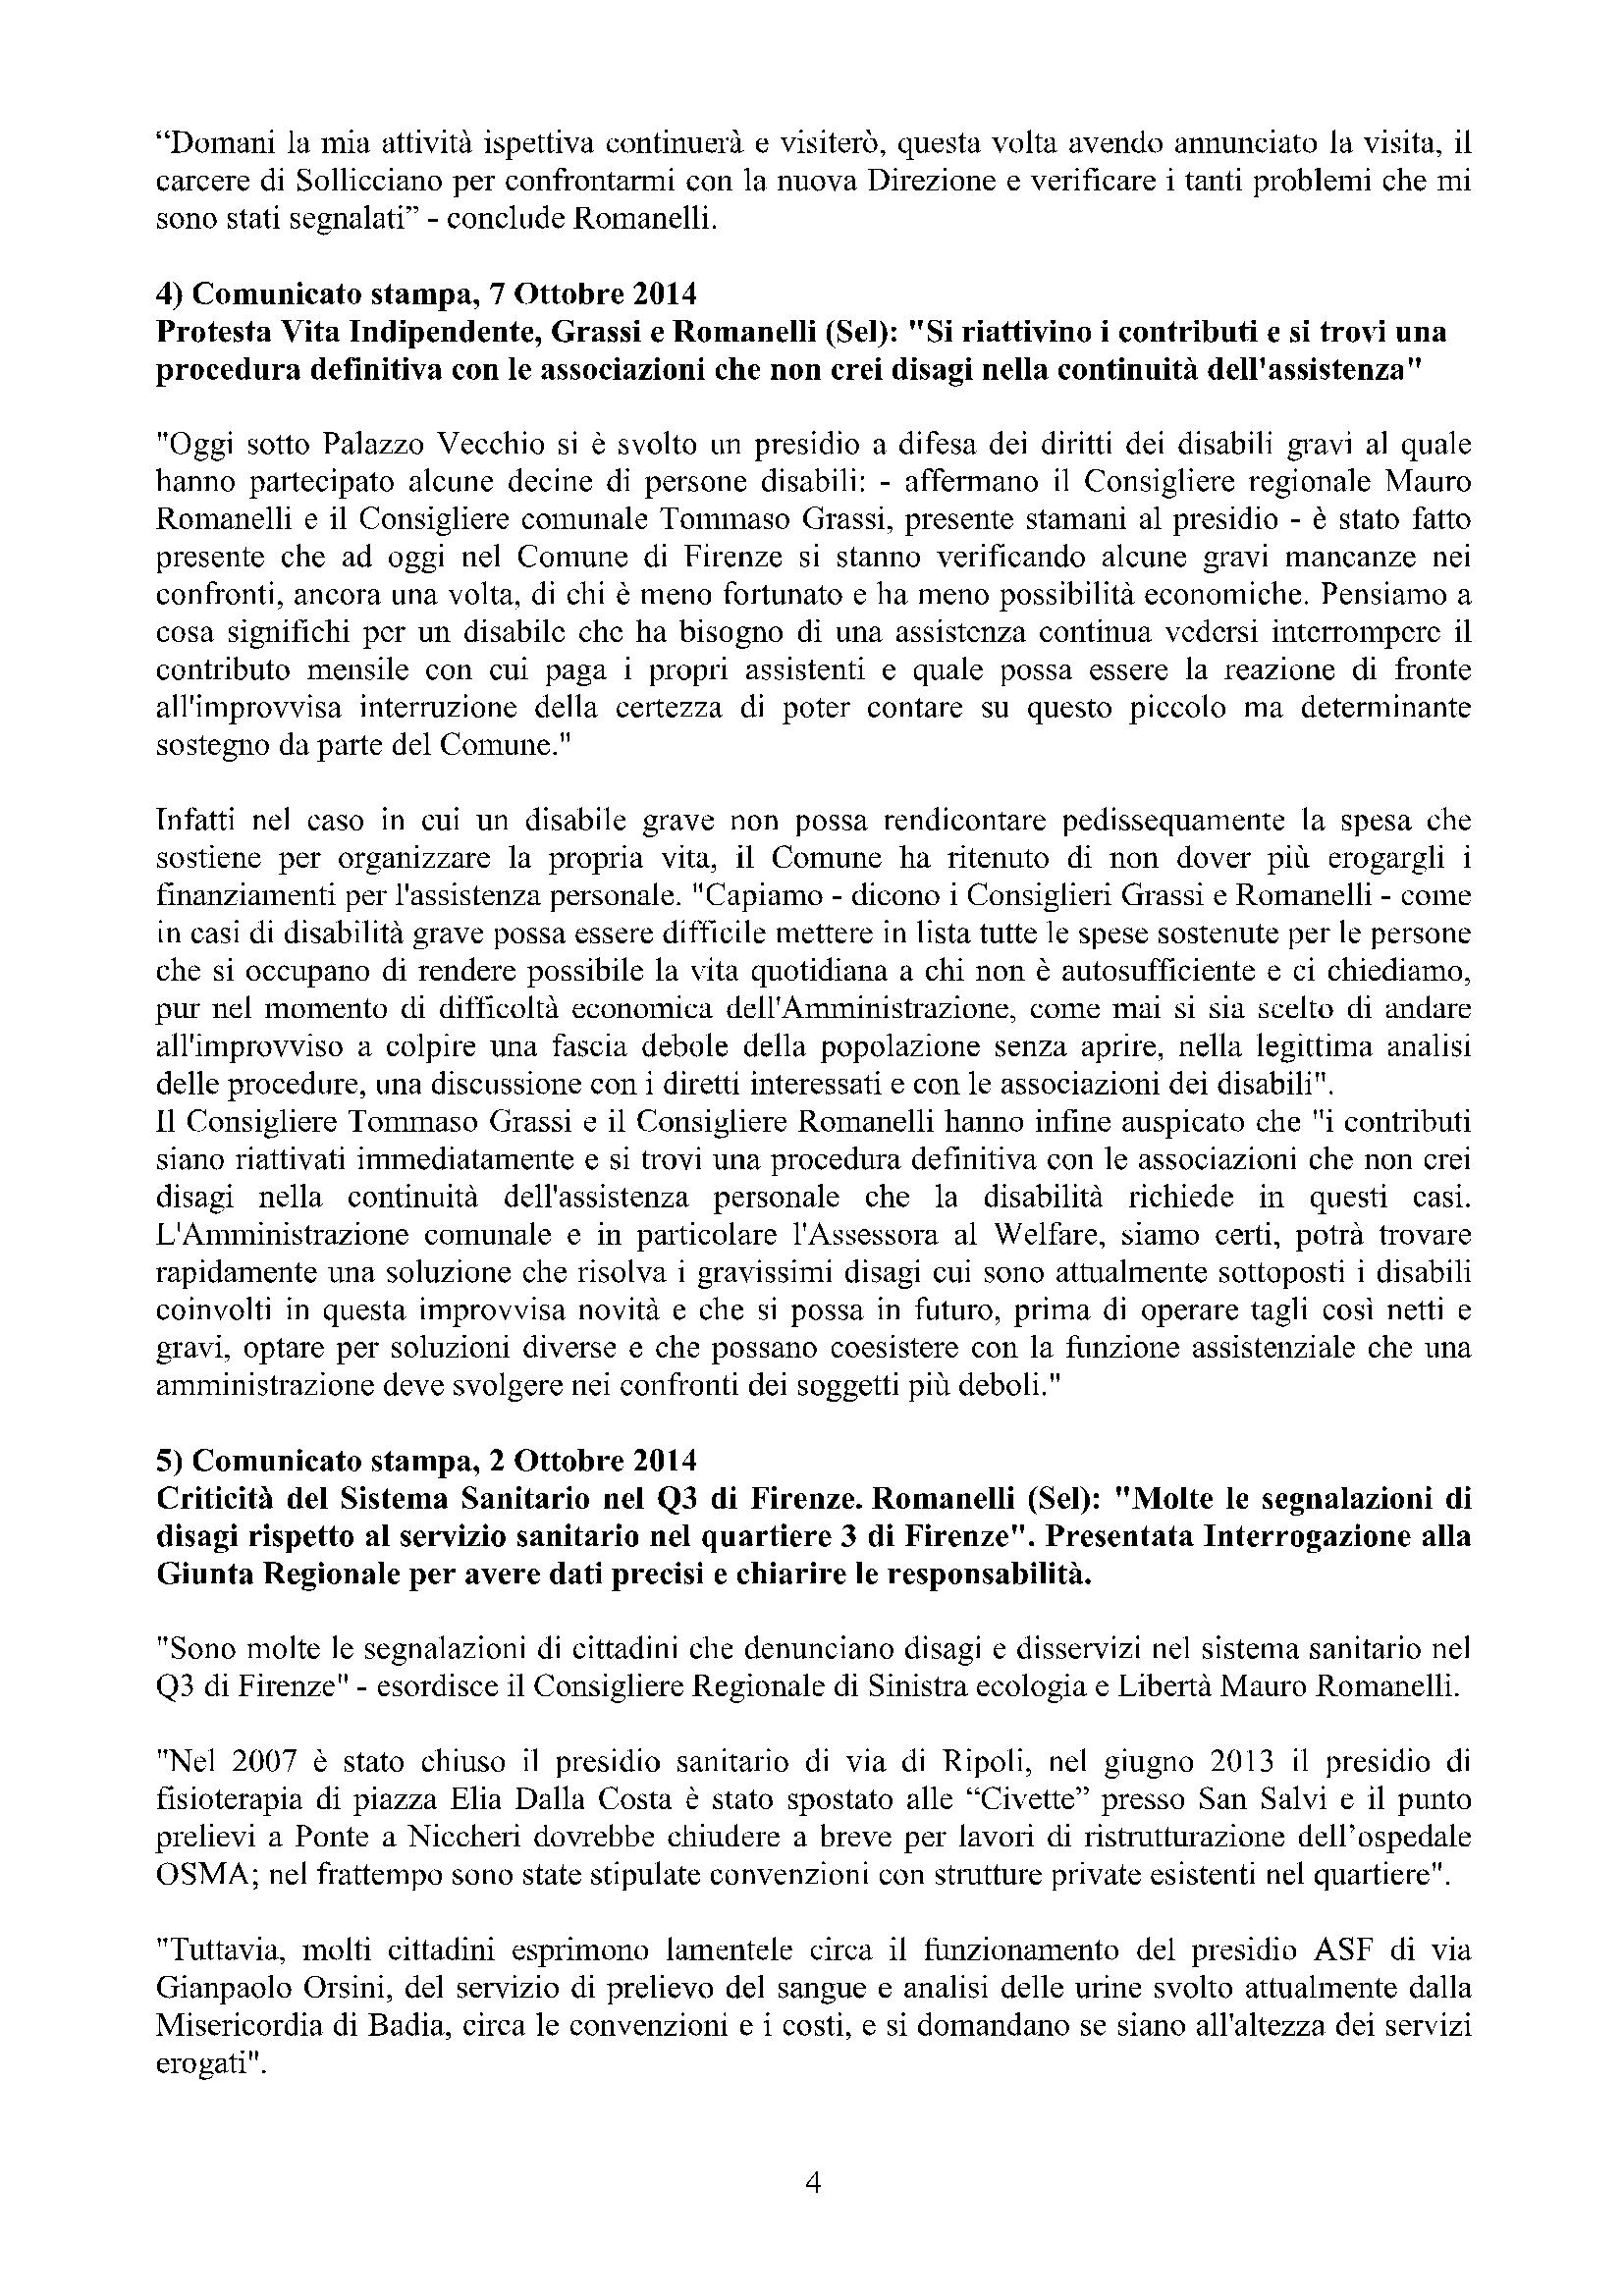 Newsletter di MAURO ROMANELLI Ottobre 2014 -4